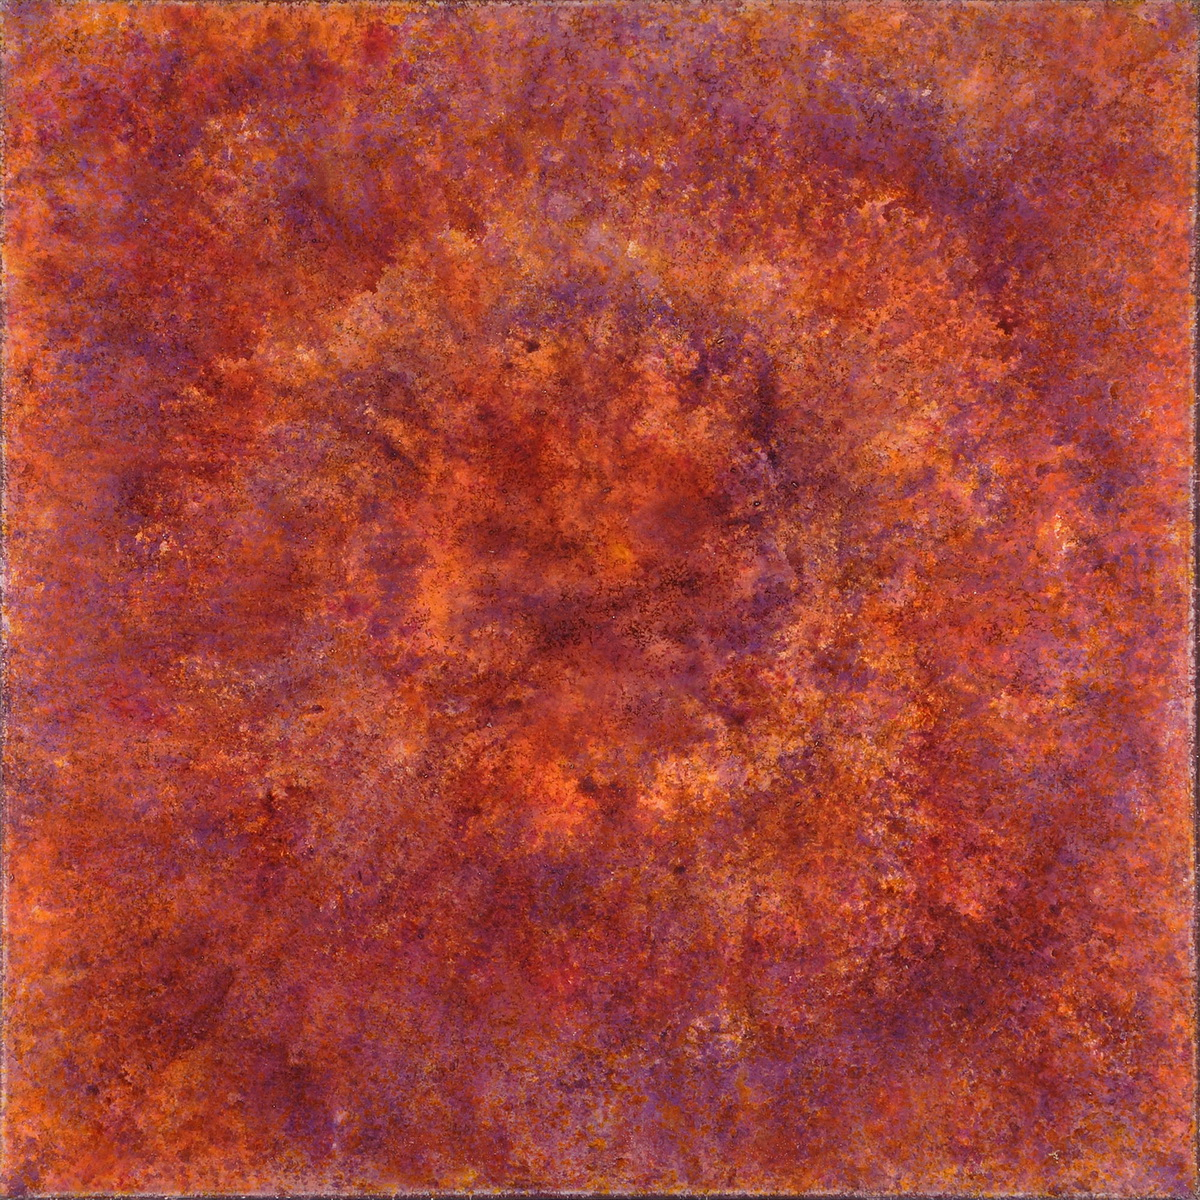 Creation-4-1998-acrylic-on-canvas-200x200-cm-80x80-inches